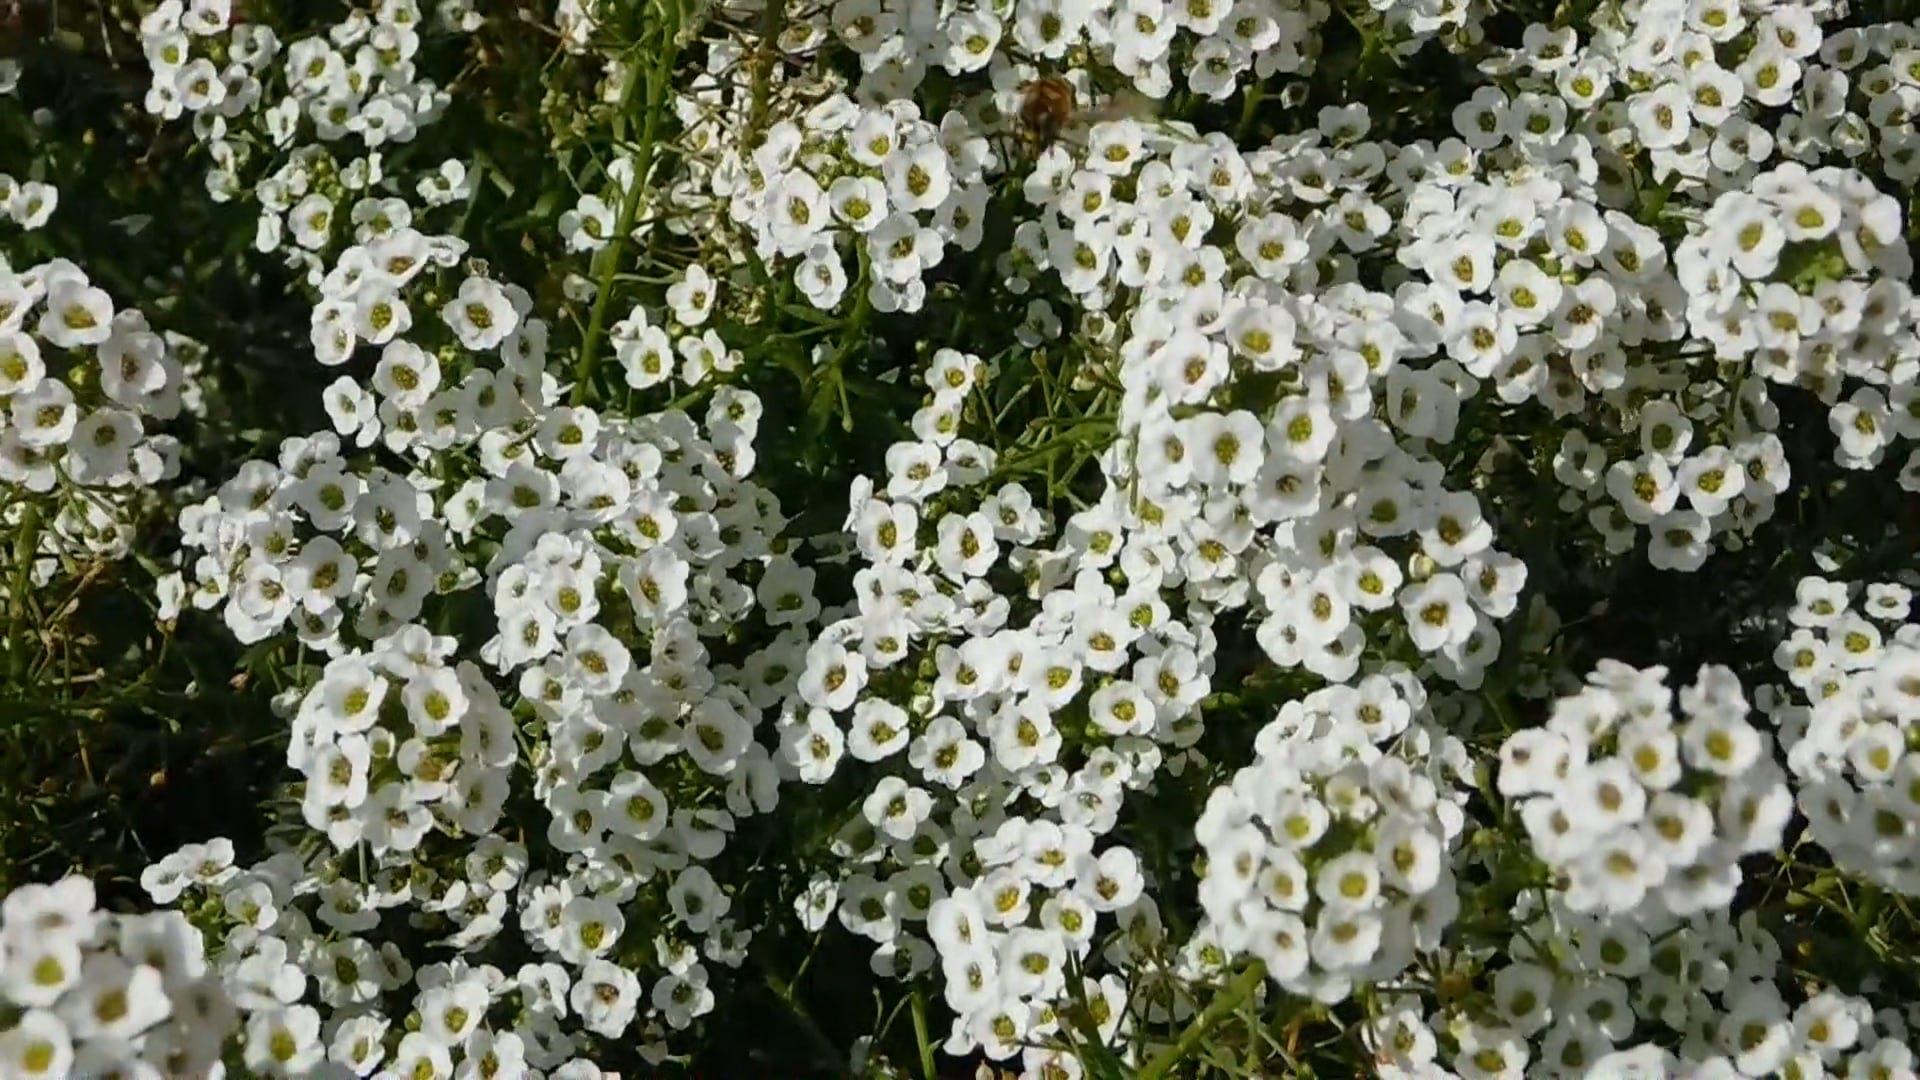 Video OfWhite Flowers